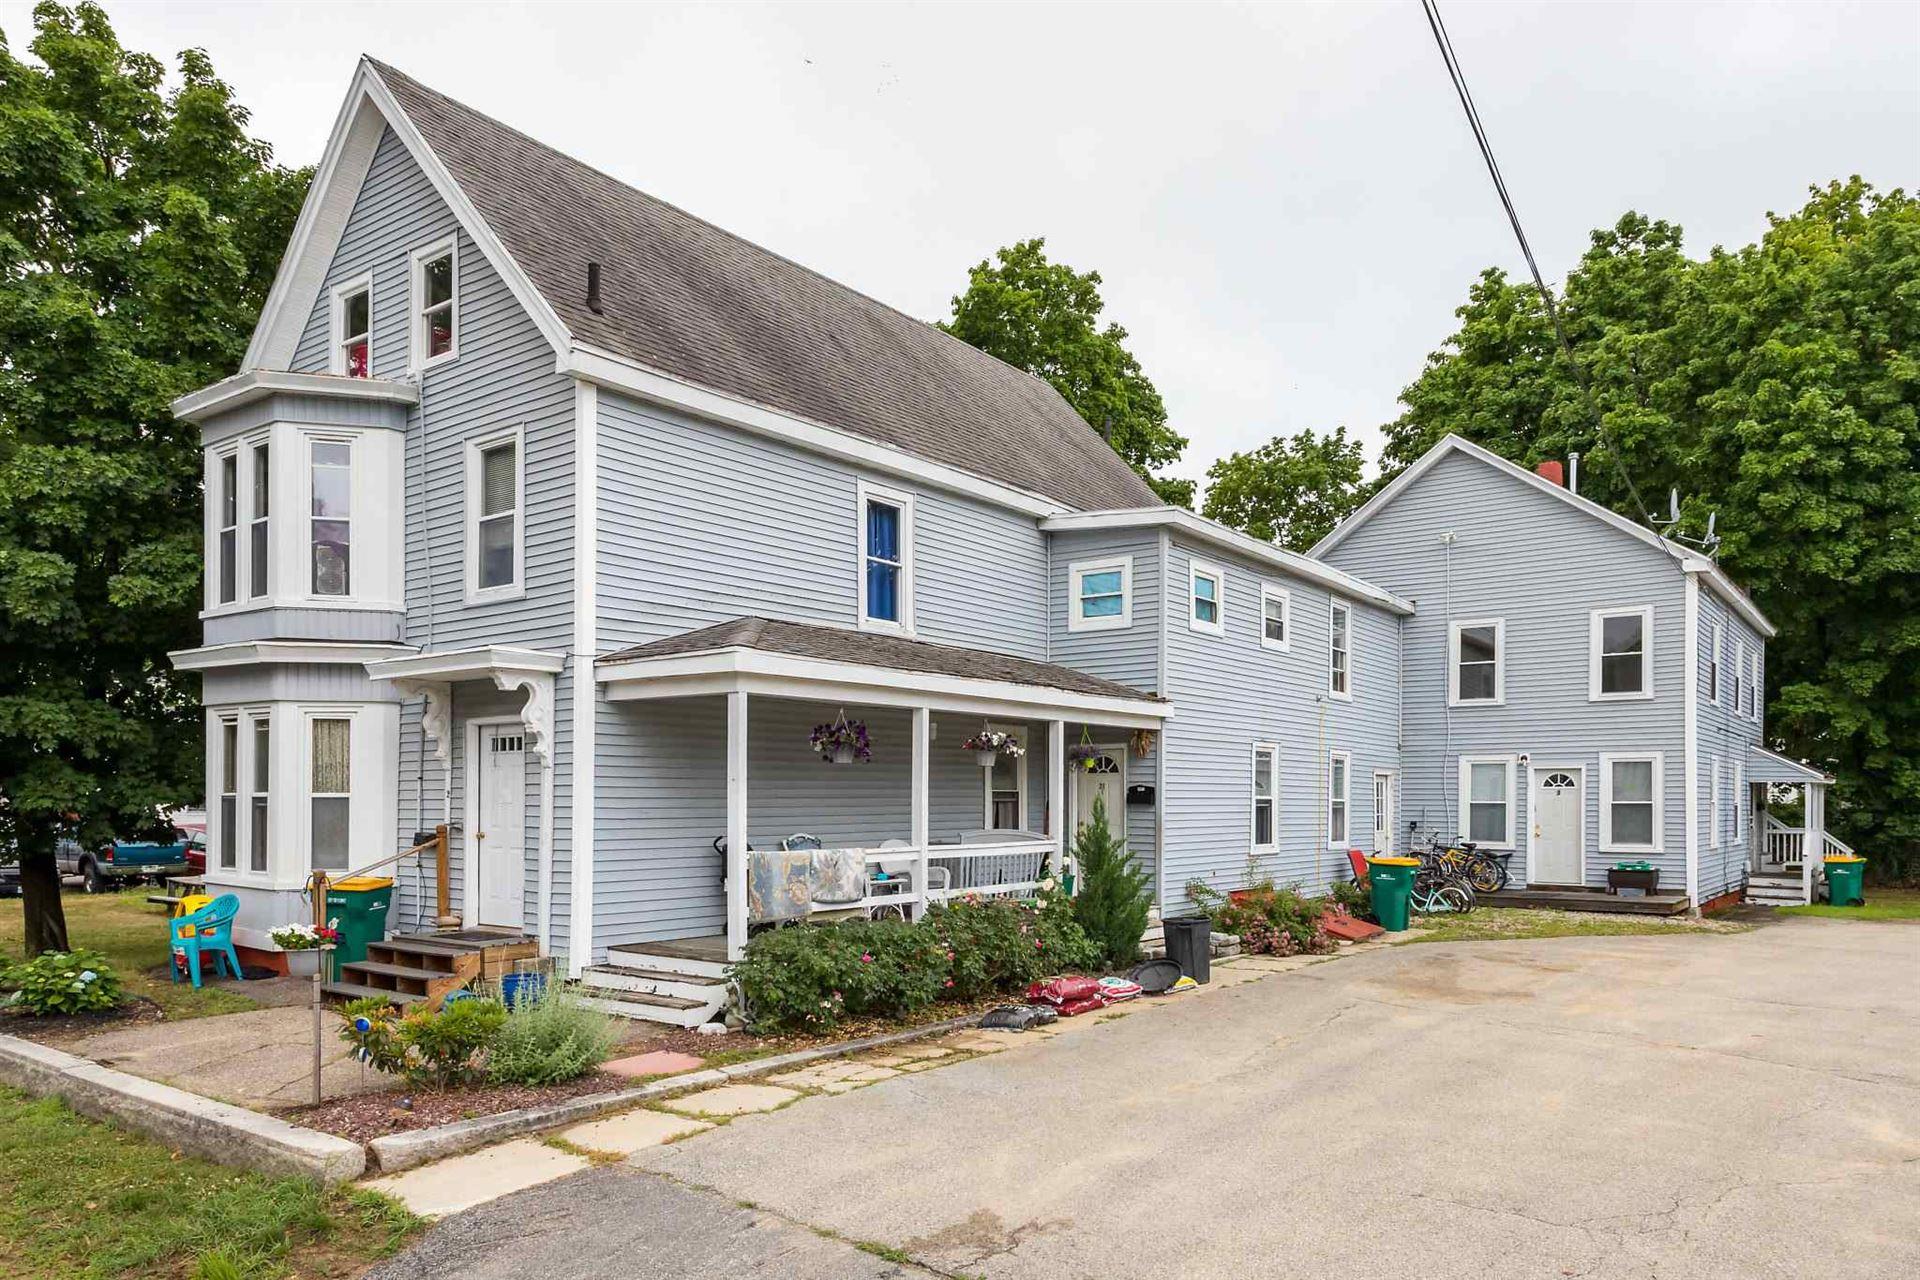 21 Knight Street, Rochester, NH 03867 - #: 4814798